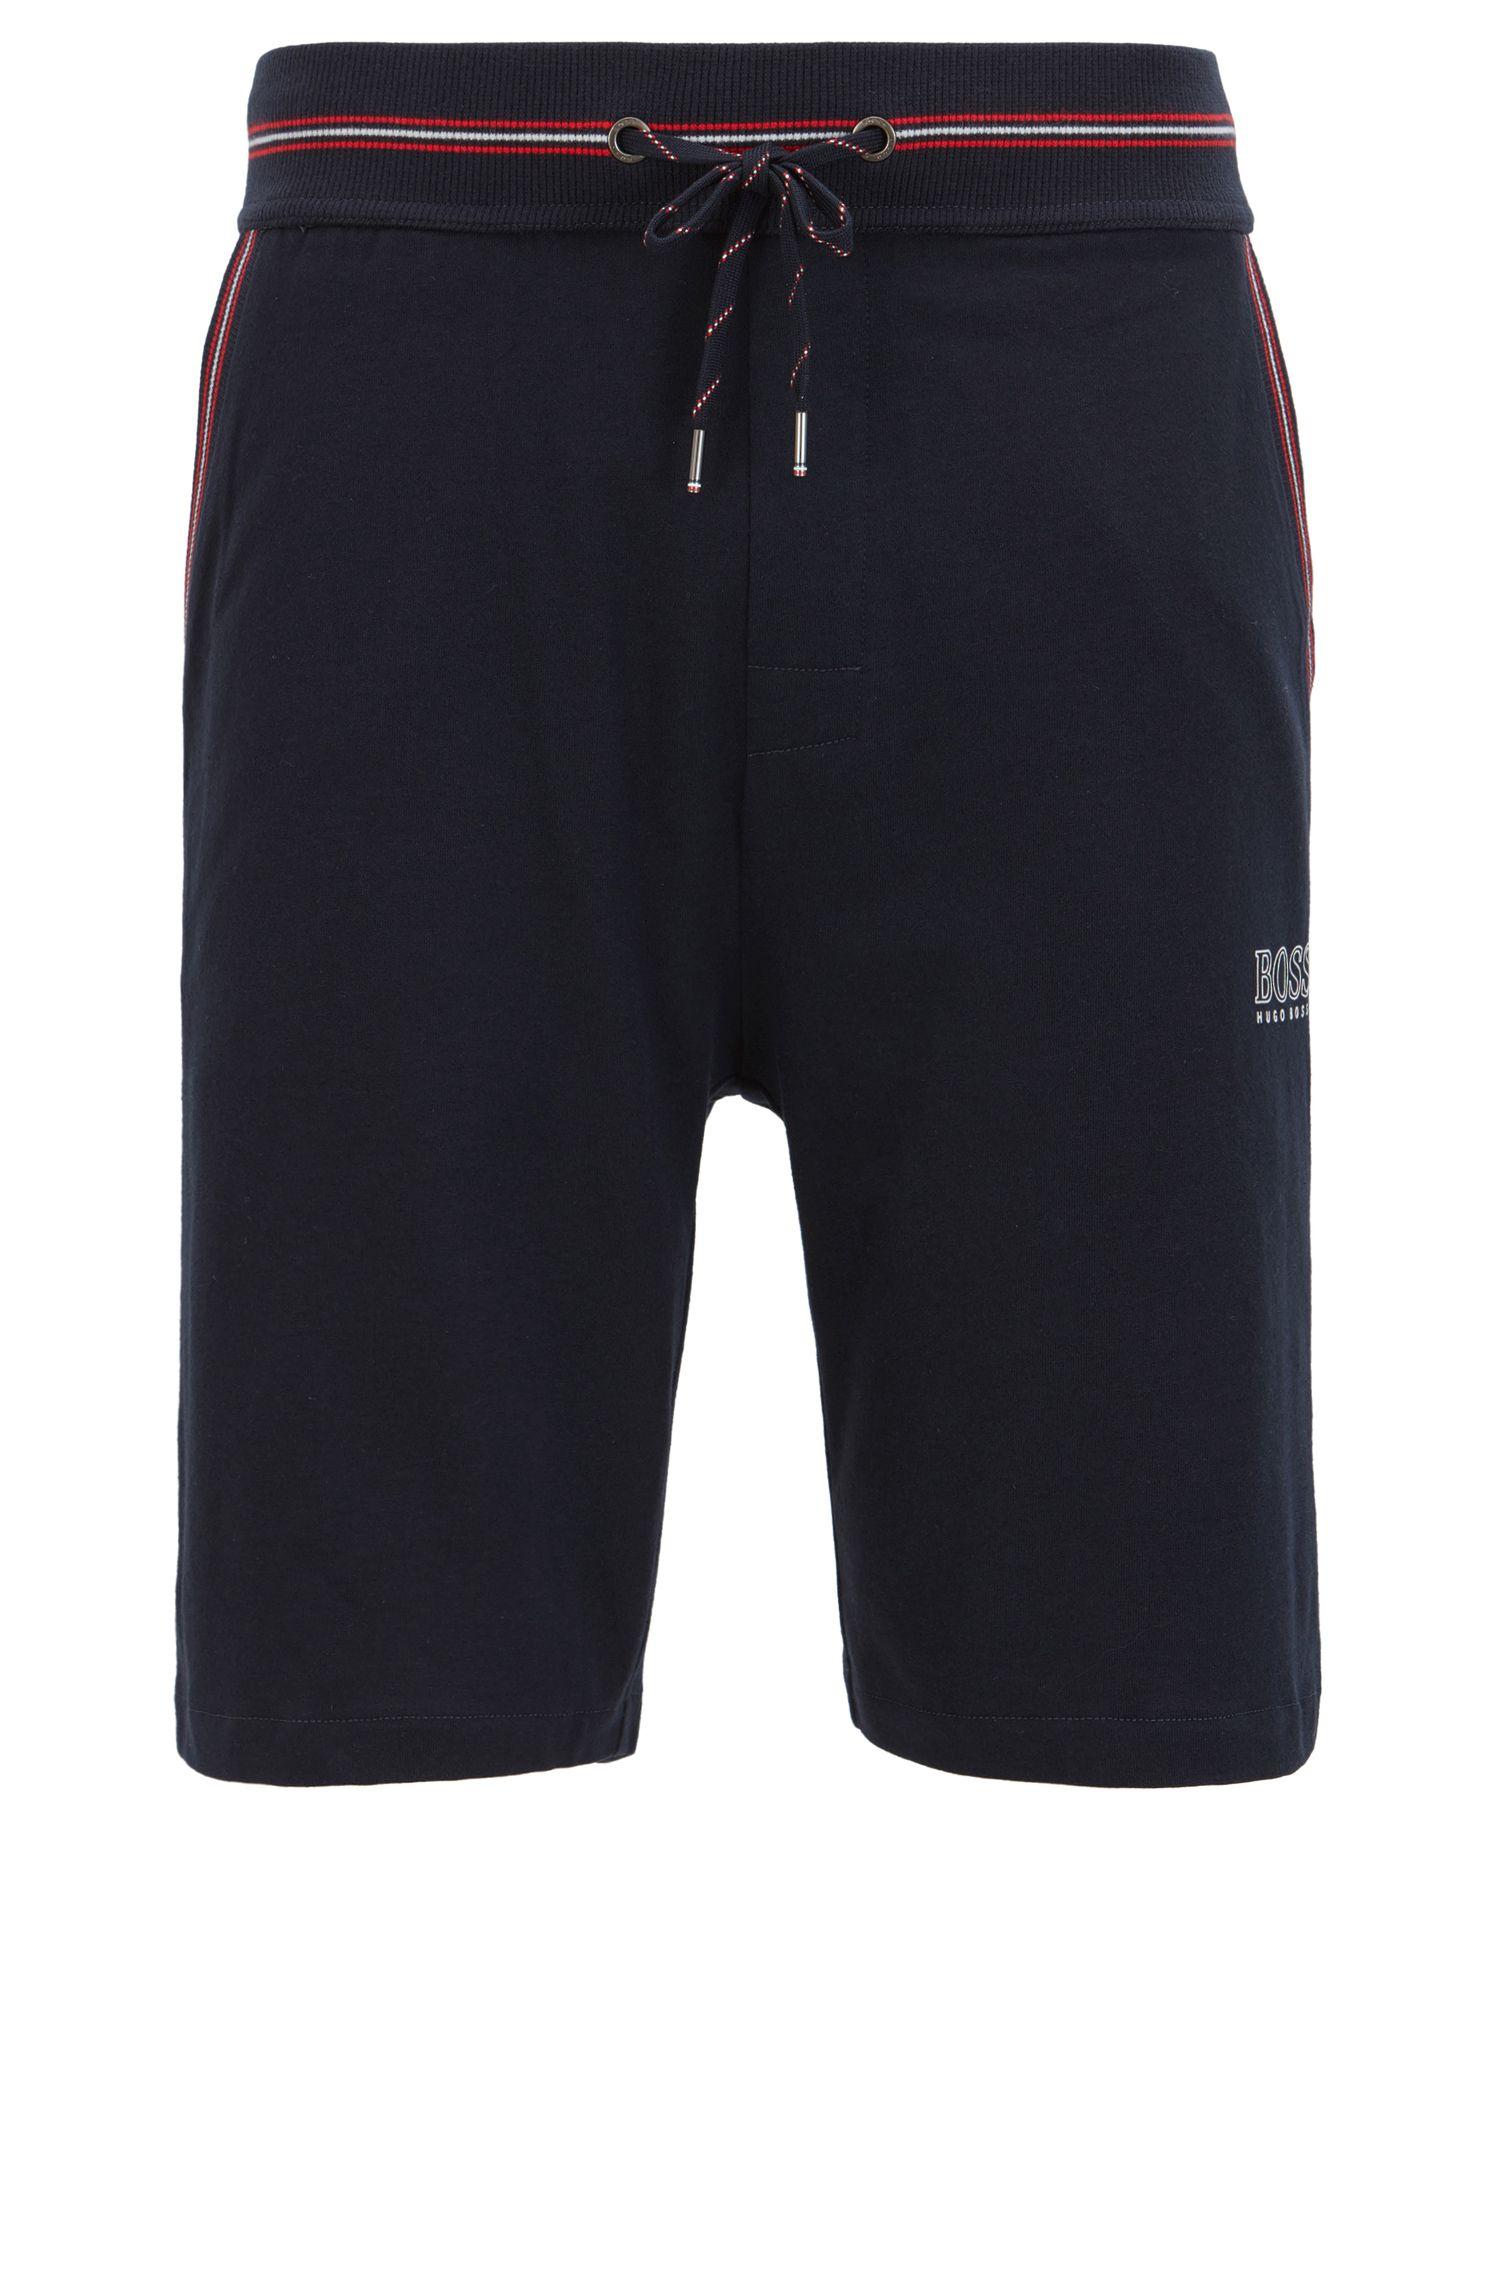 Single-jersey loungewear shorts with drawstring waist